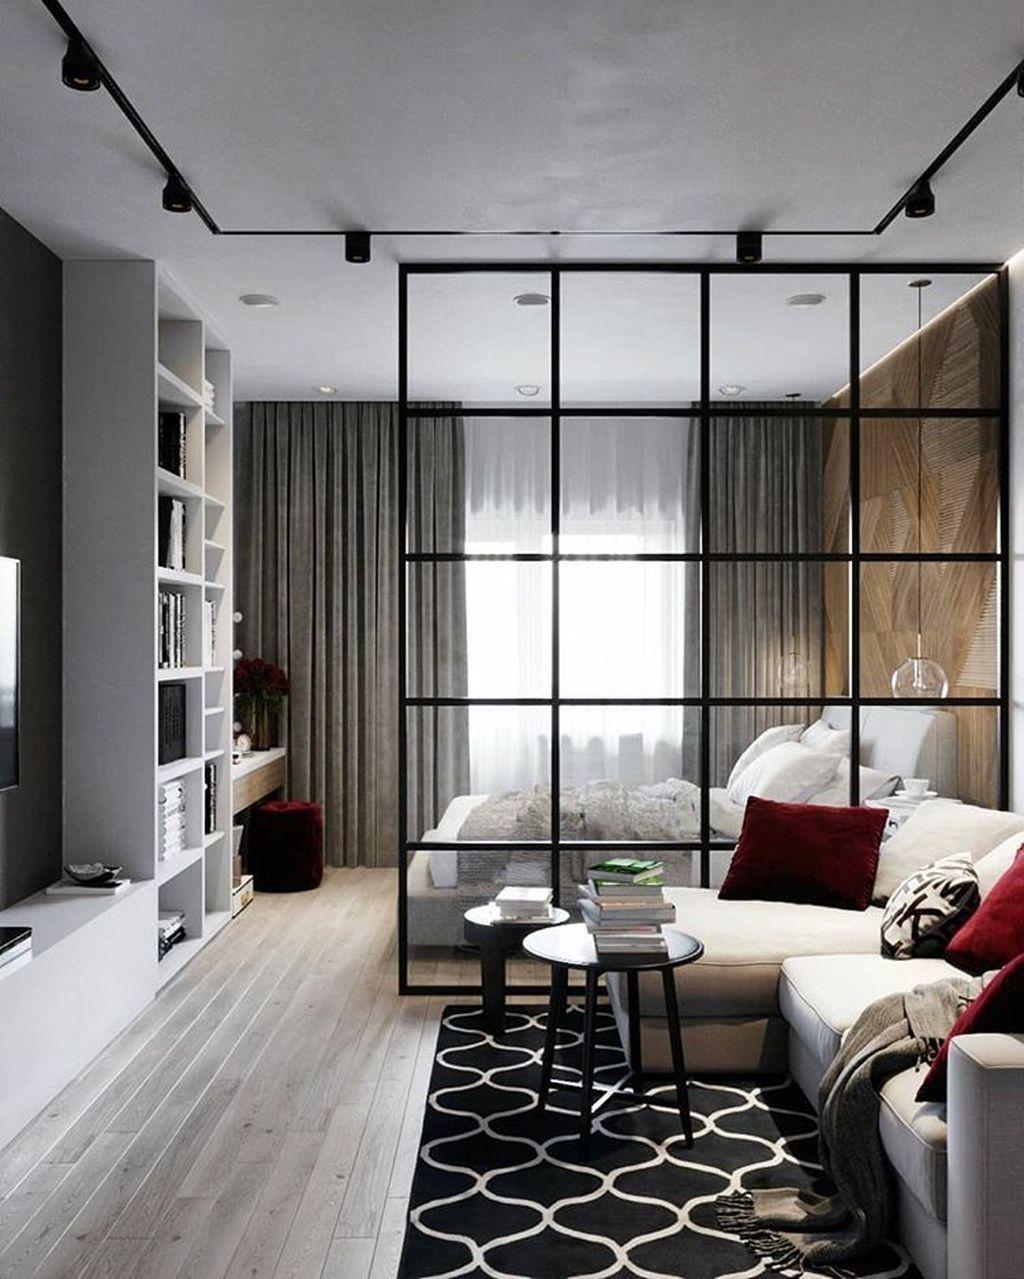 20 Fabulous Studio Apartment Decor Ideas On A Budget 2048 Apartment Budget Decor Fabulou Studio Apartment Living Small Apartment Interior Apartment Room